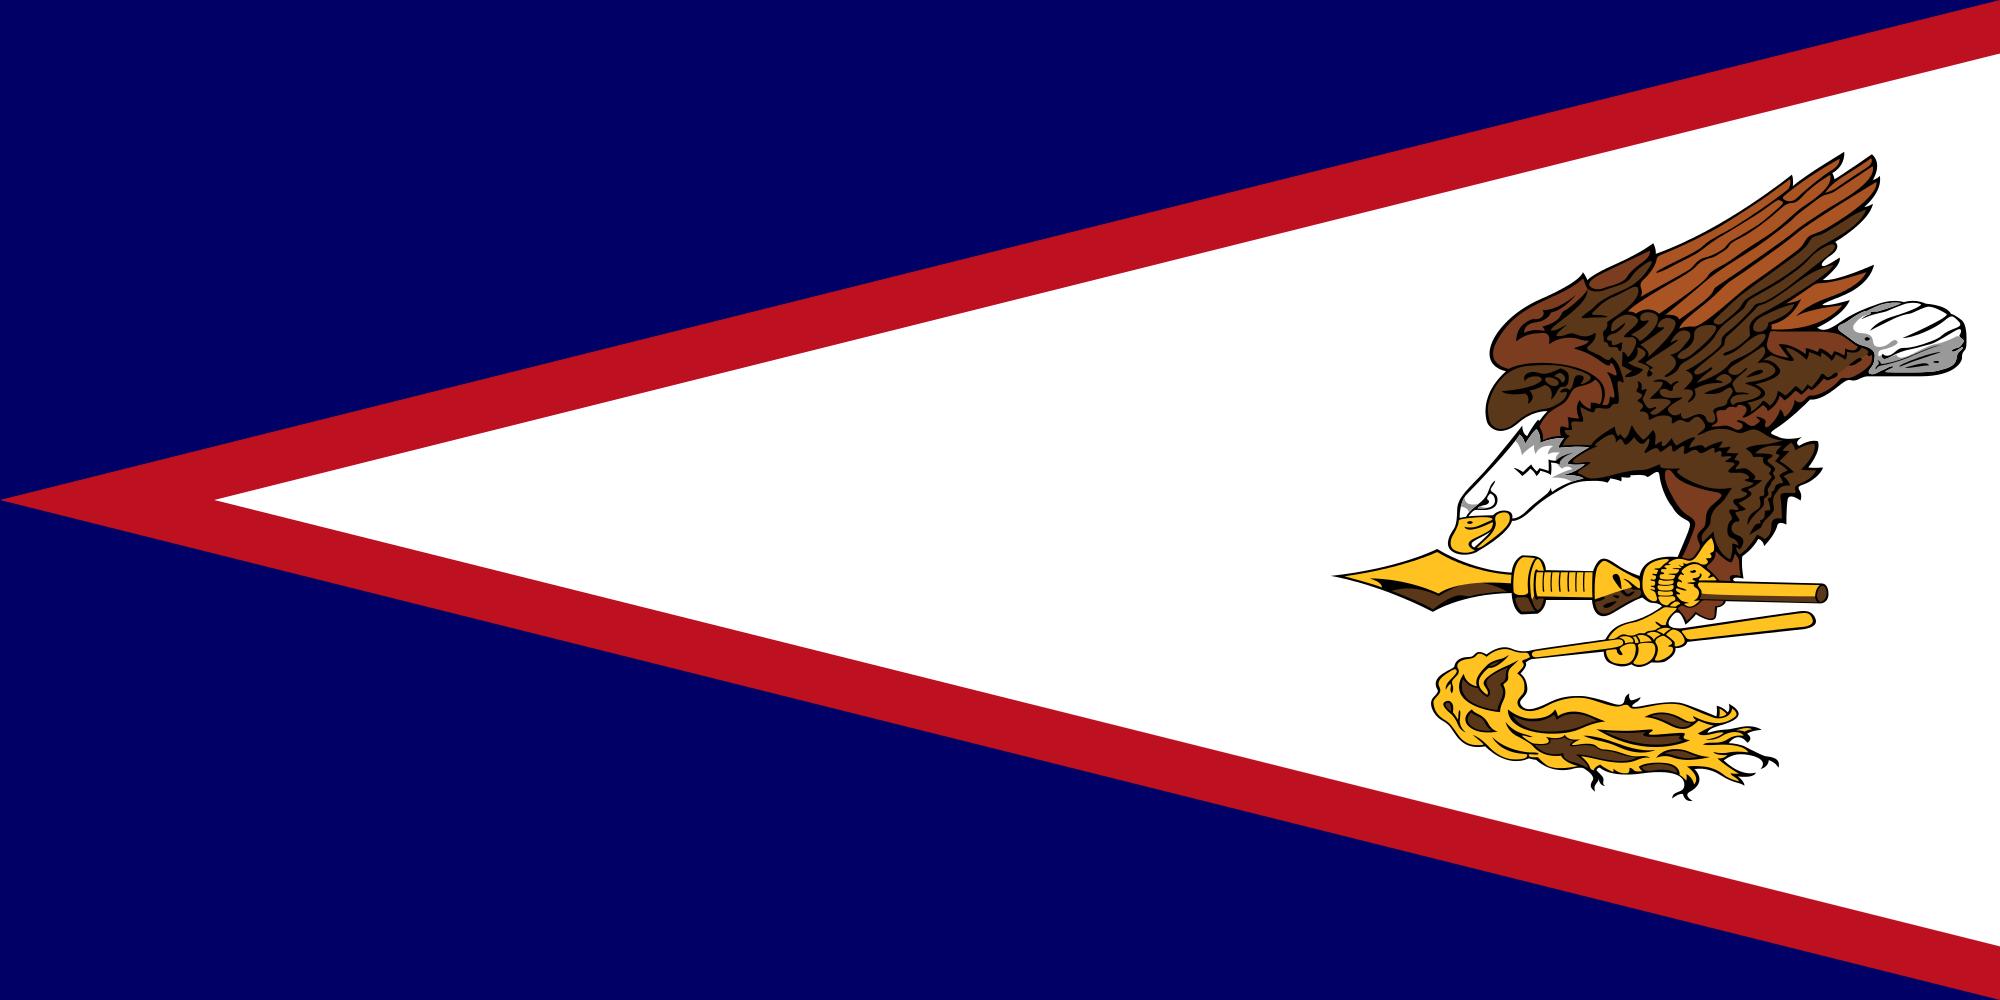 samoa americana, χώρα, έμβλημα, λογότυπο, σύμβολο - Wallpapers HD - Professor-falken.com